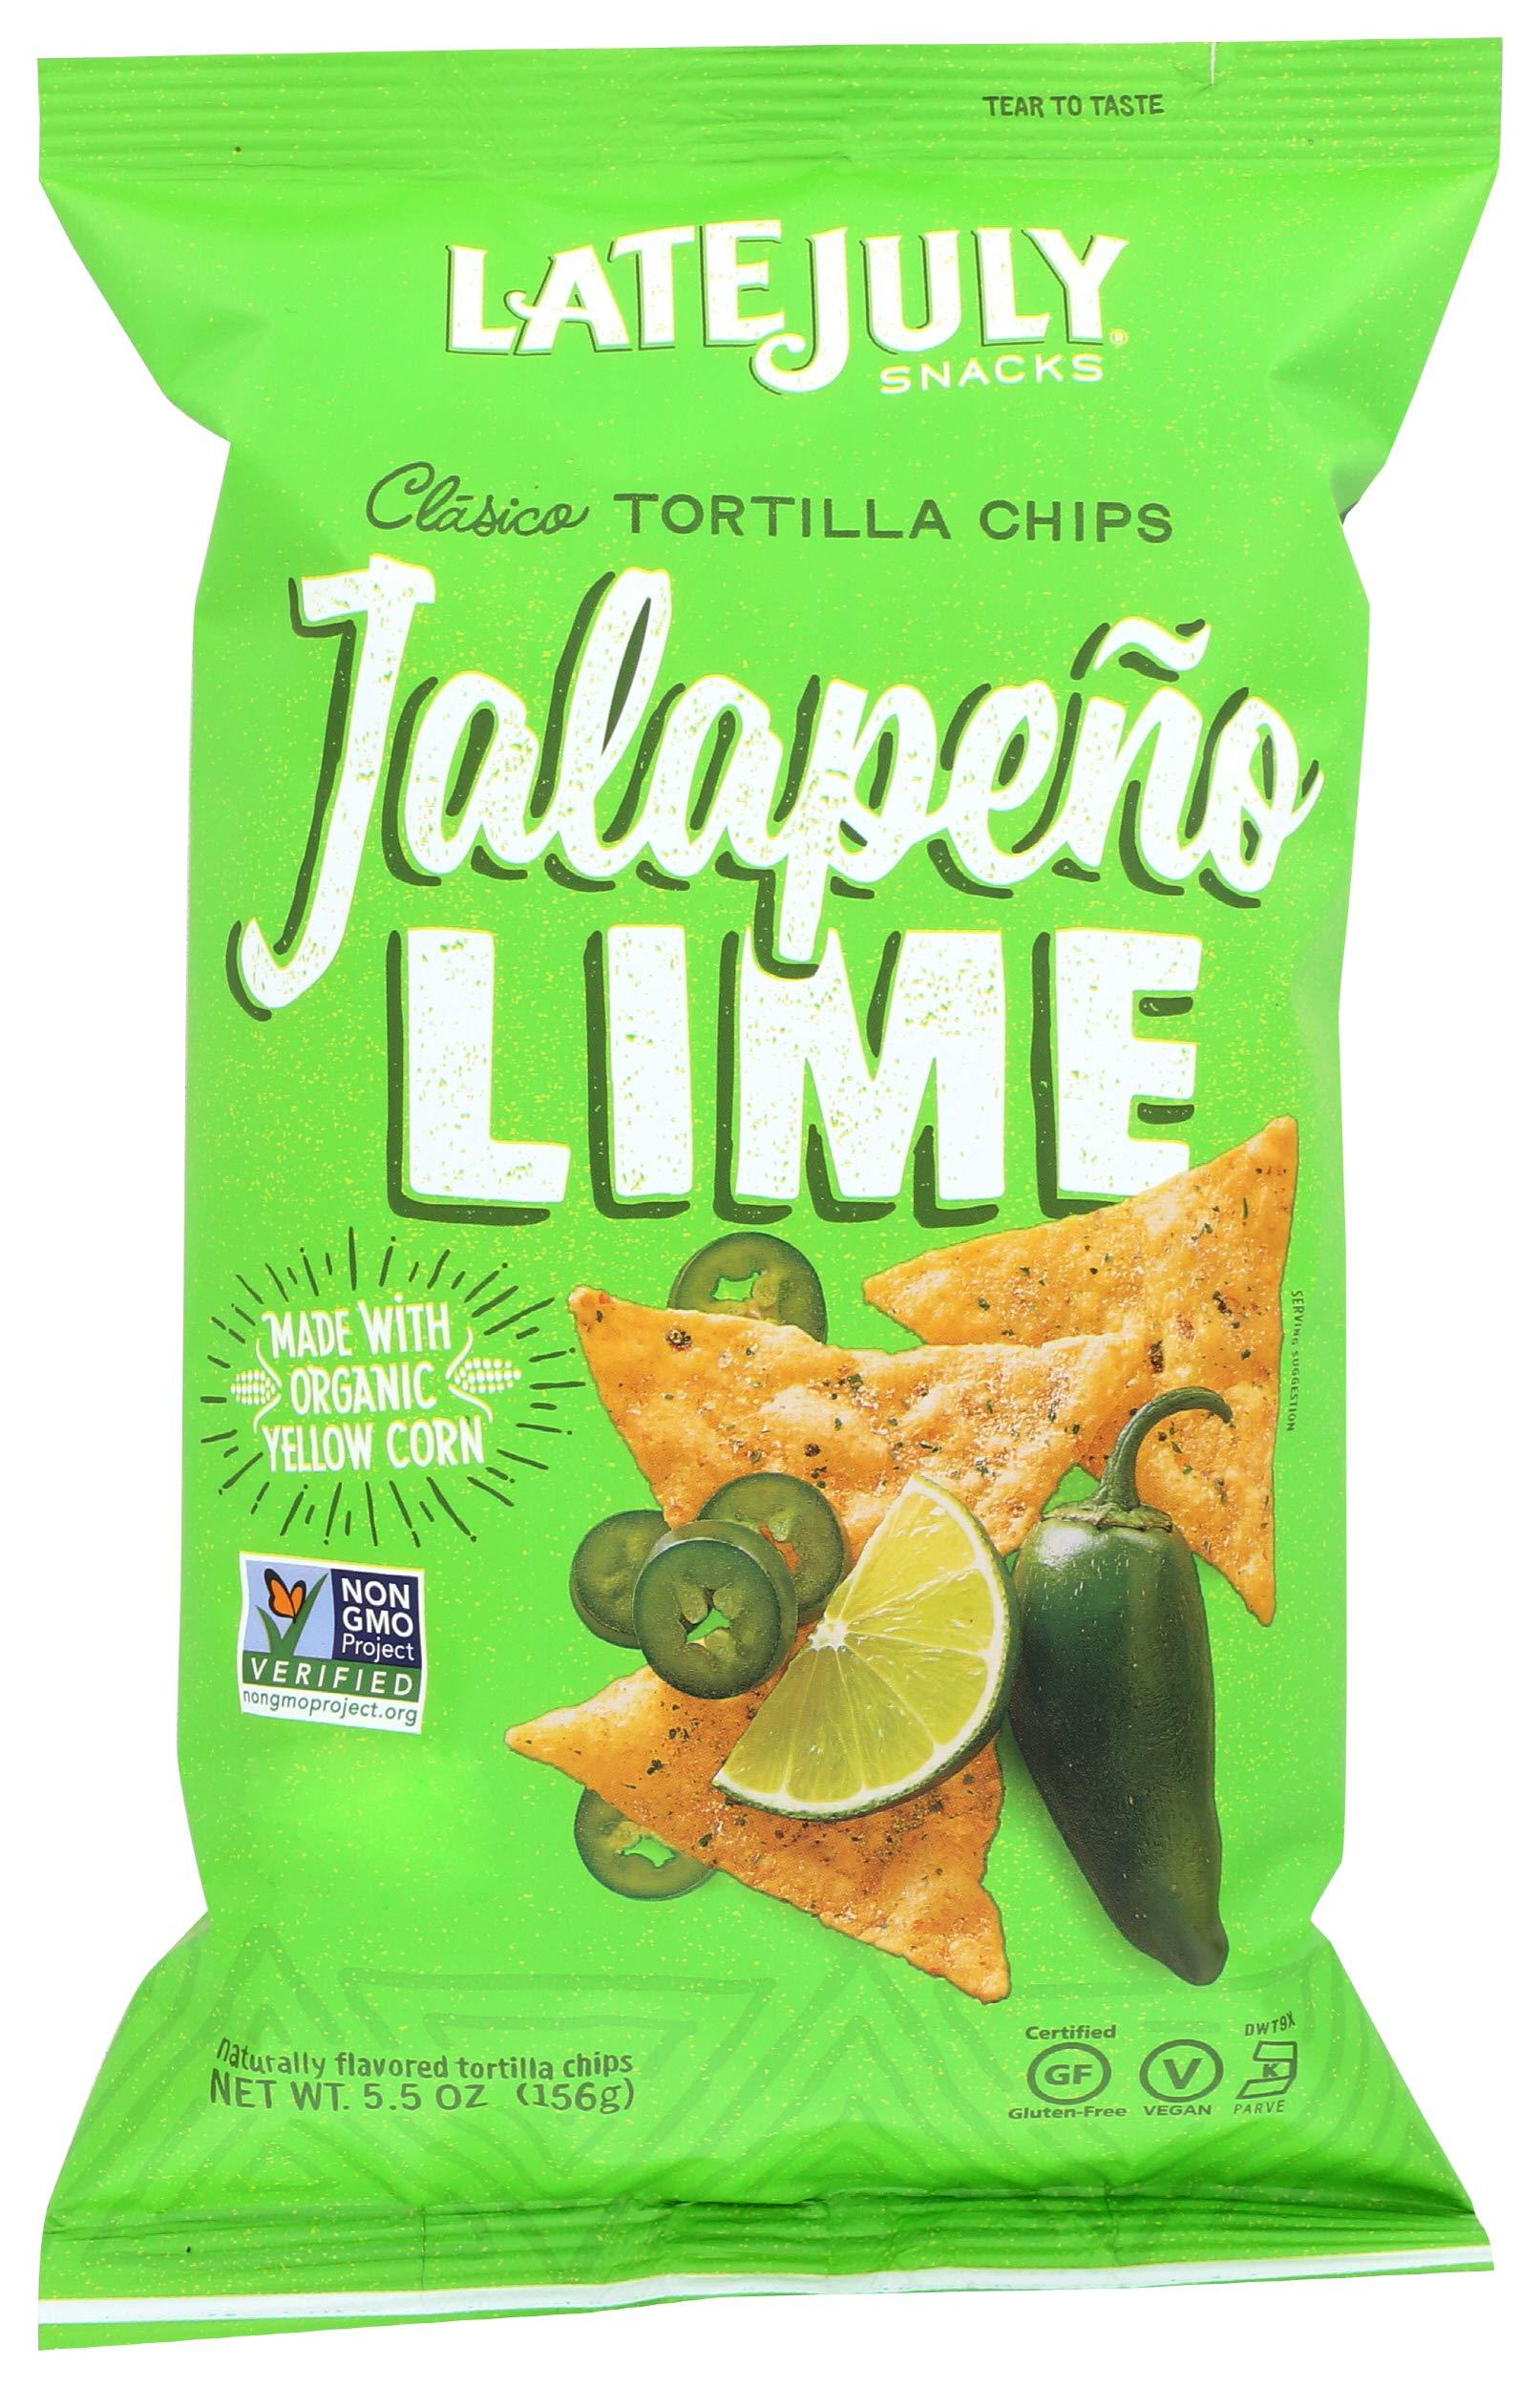 LATE JULY Snacks Clásico Jalapeño Lime Tortilla Chips, 5.5 oz. Bag